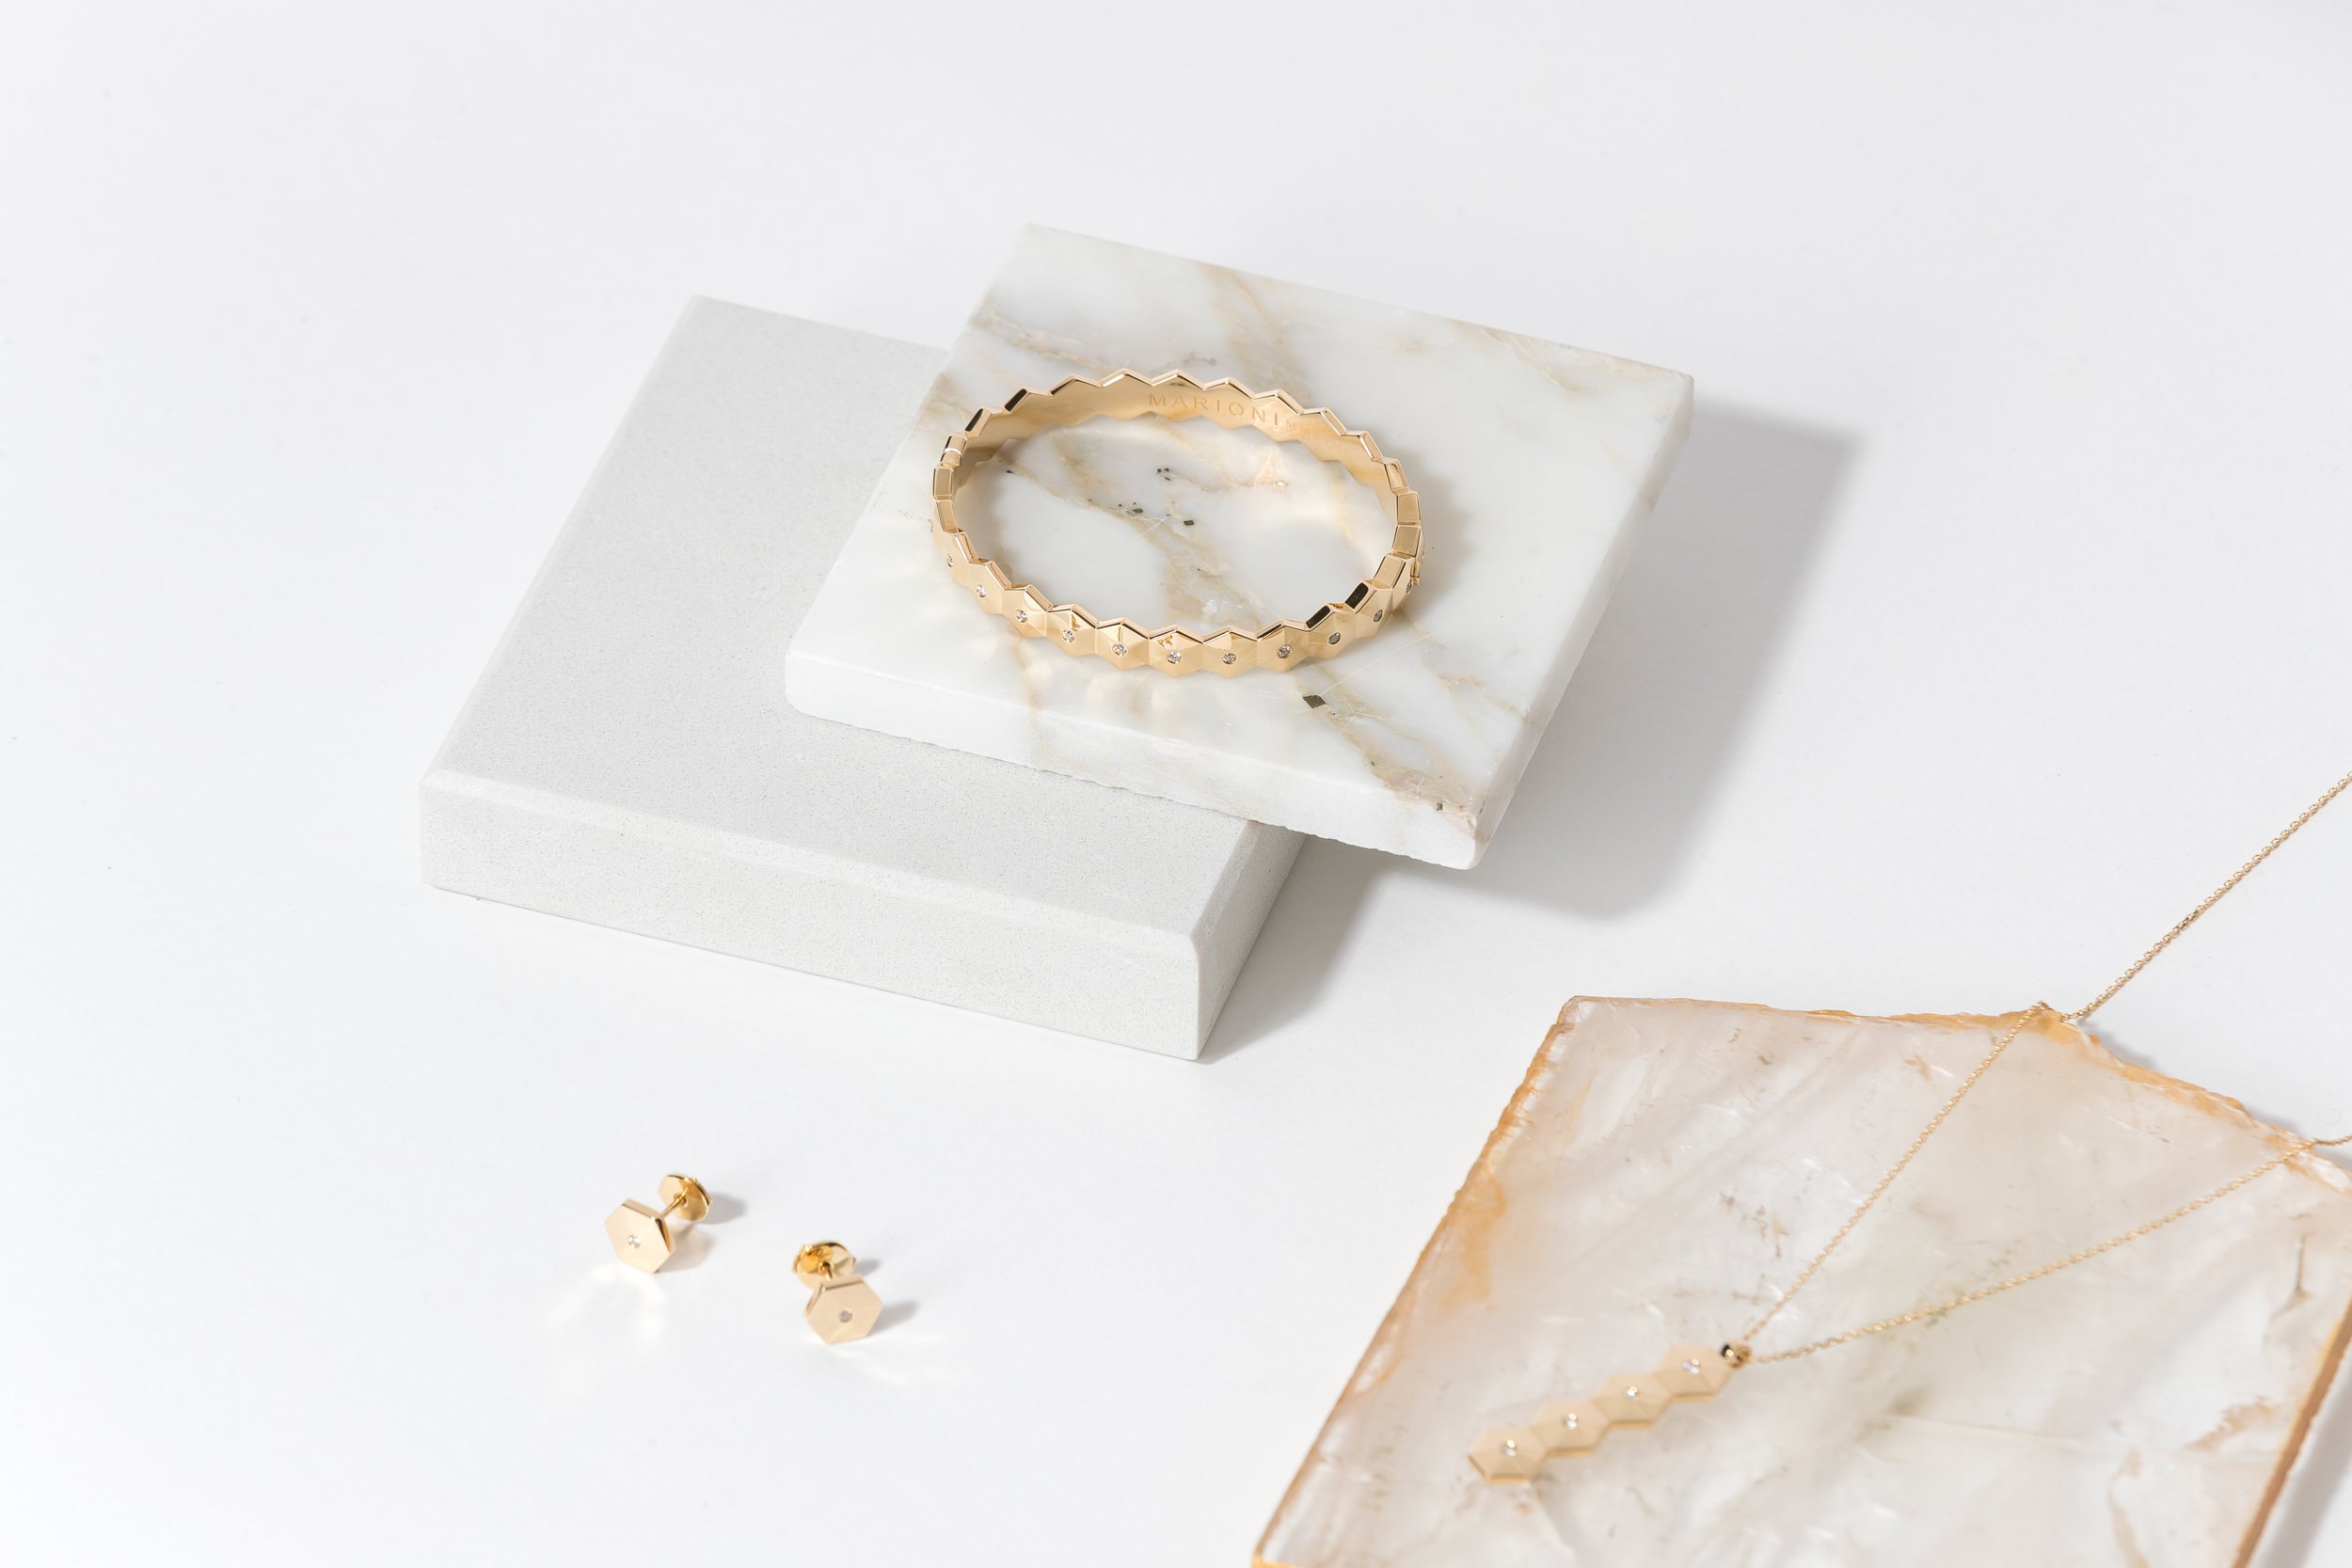 ABE1_Marioni_Jewelry_Studio_Flatlays-6.jpg